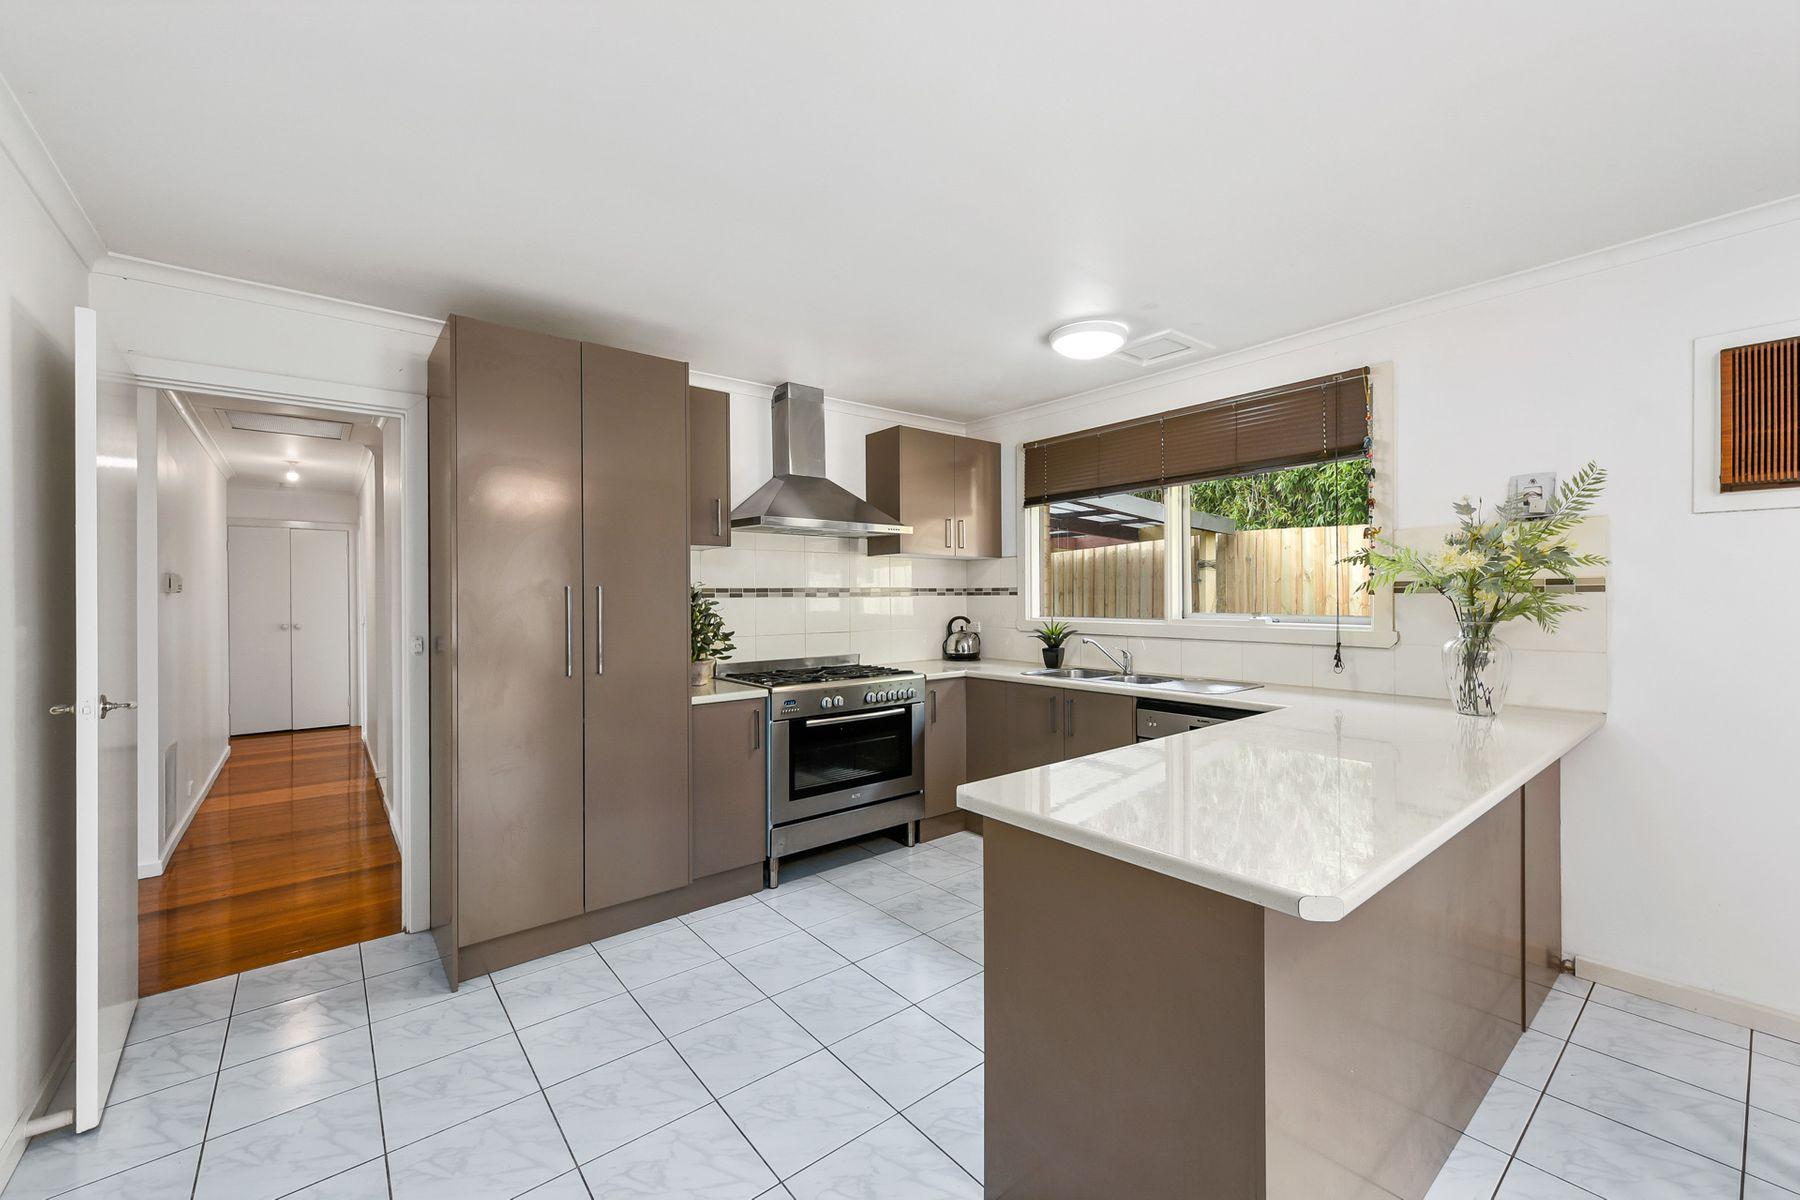 19 Aldridge Street, Endeavour Hills, VIC 3802